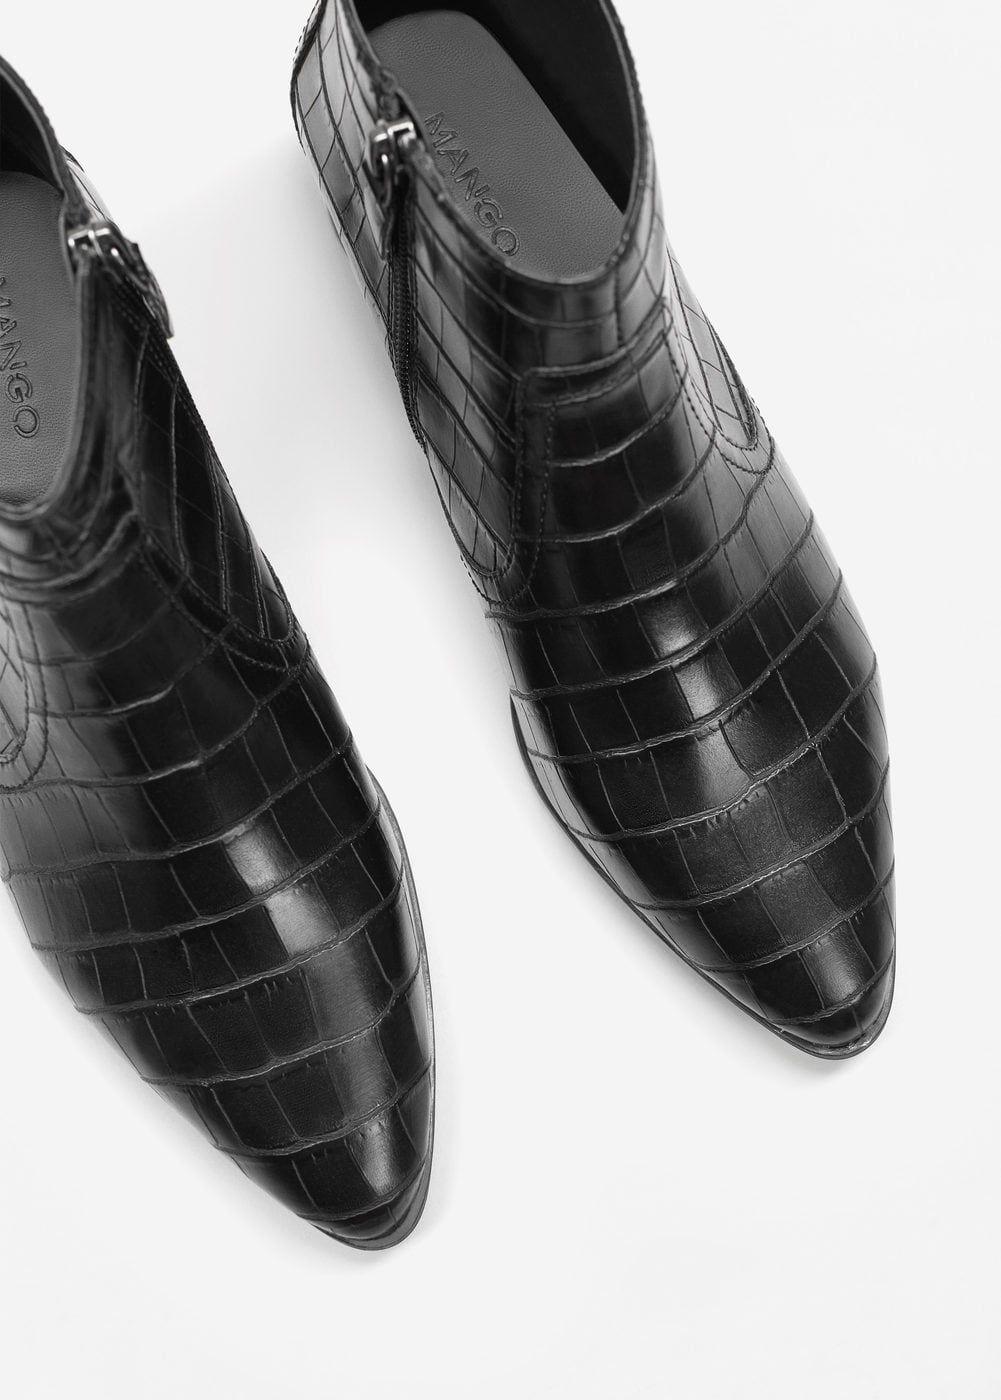 Bottines Effet Croco Femme Shoes Pinterest Botins Botas And